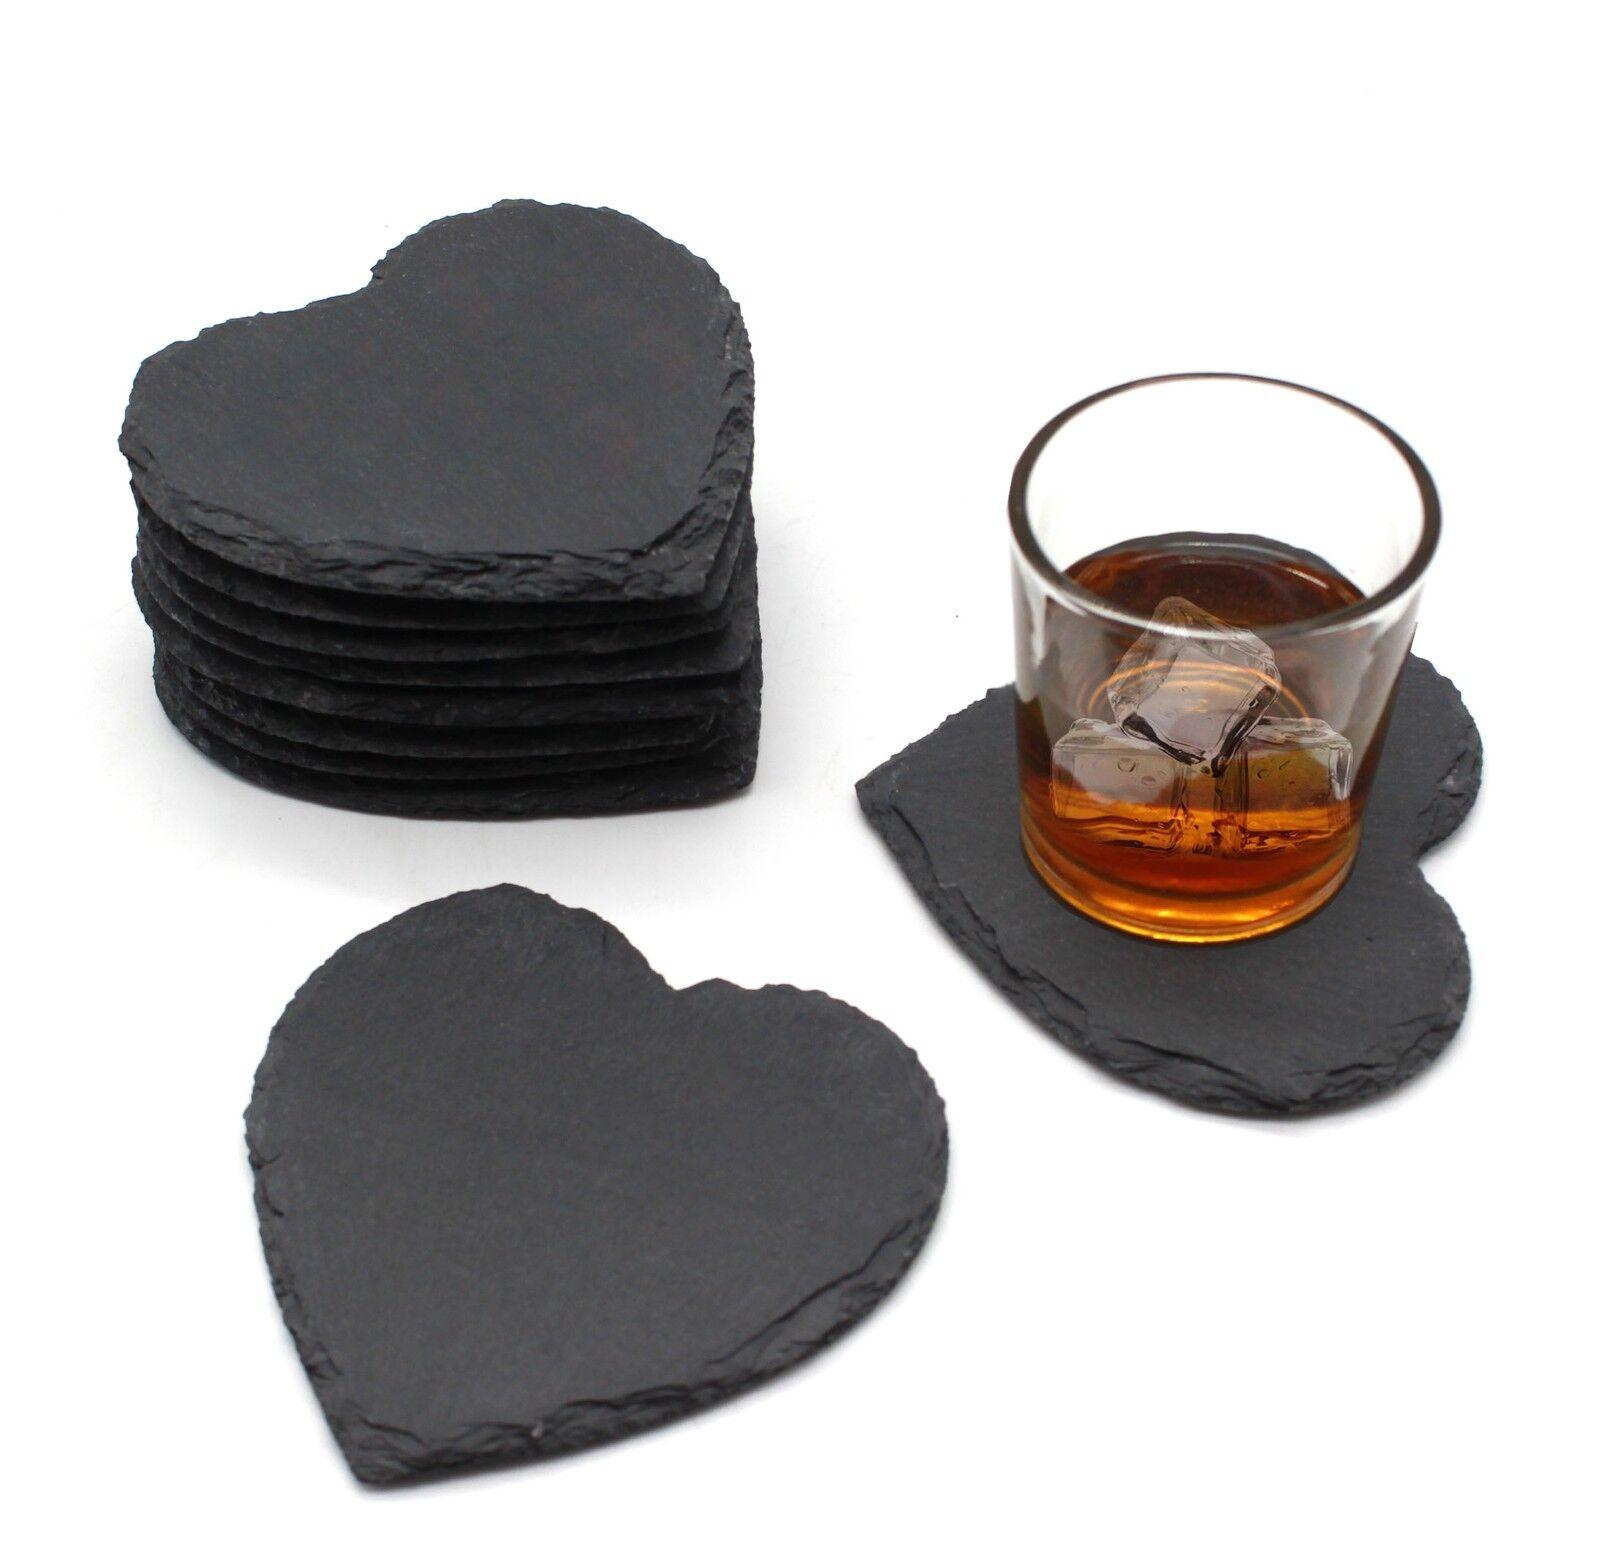 48pcs RUSTIC Natural Slate Cuore CoffeeTable Tazza Bevanda Tazza Mat Coaster VENDITA BULK